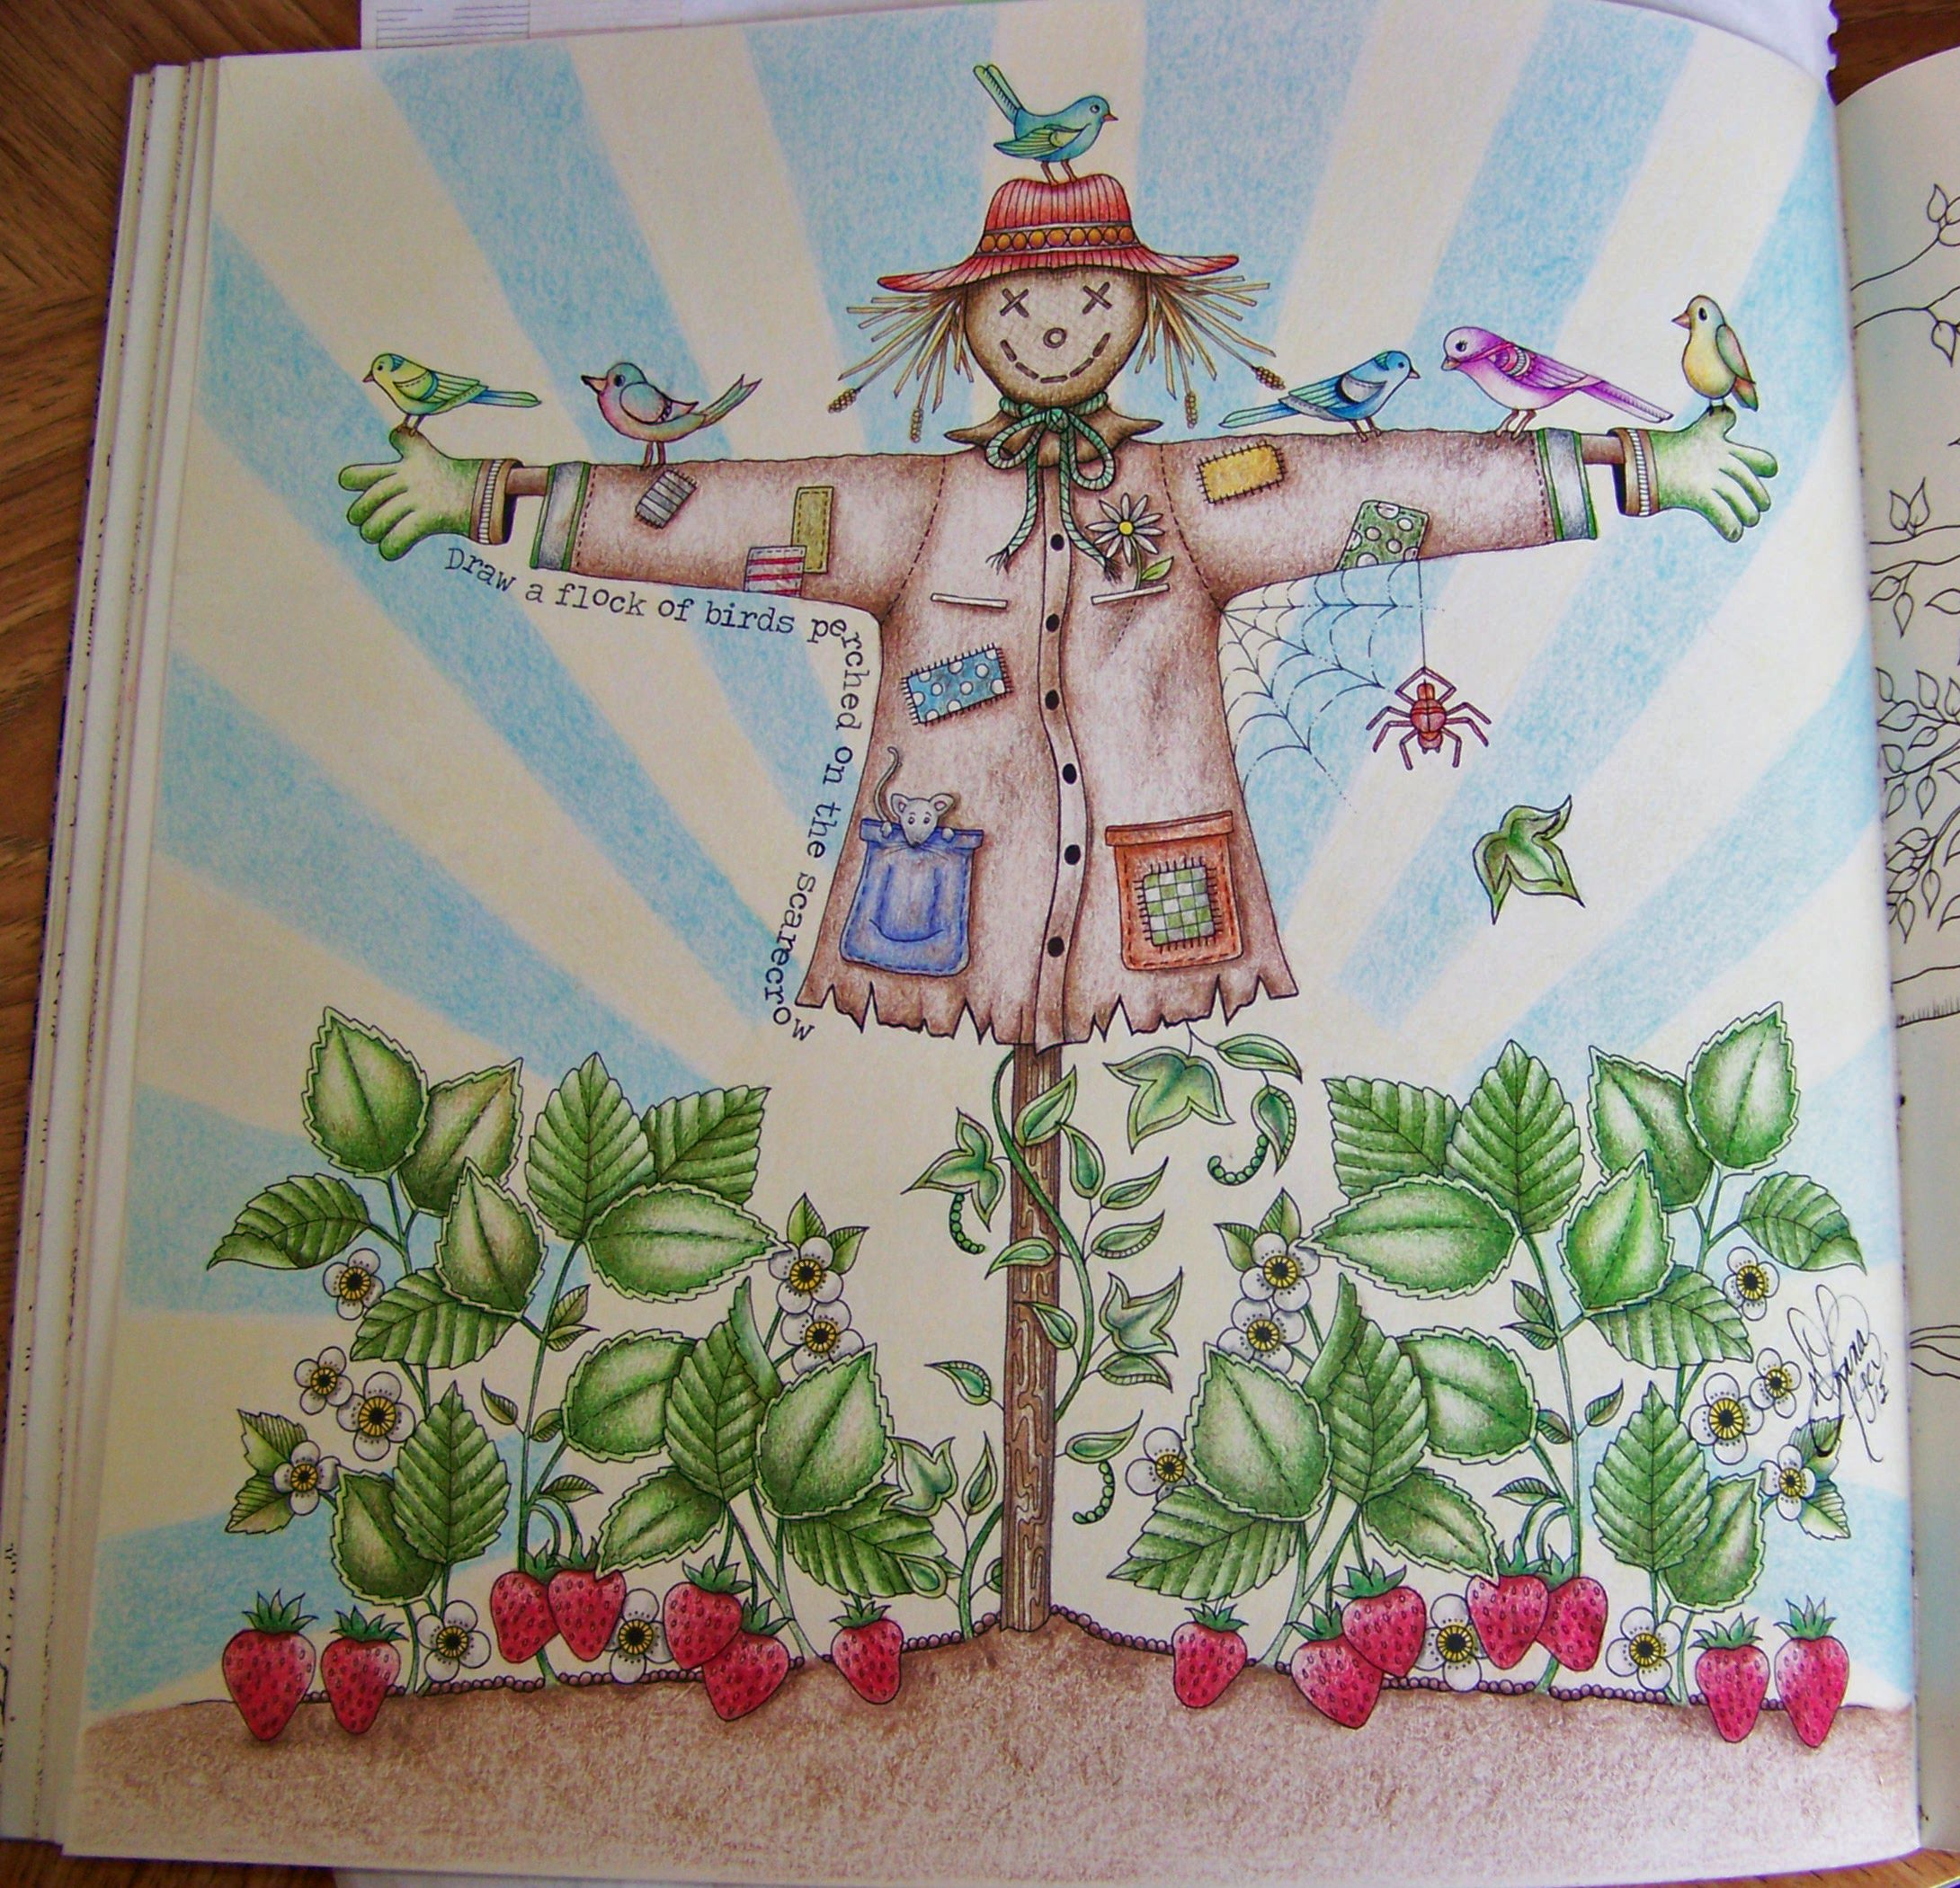 Secret garden coloring book website - Adult Coloring Book Secret Garden Johanna Basford Scarecrow Done With Prismacolor Scholar By Donna